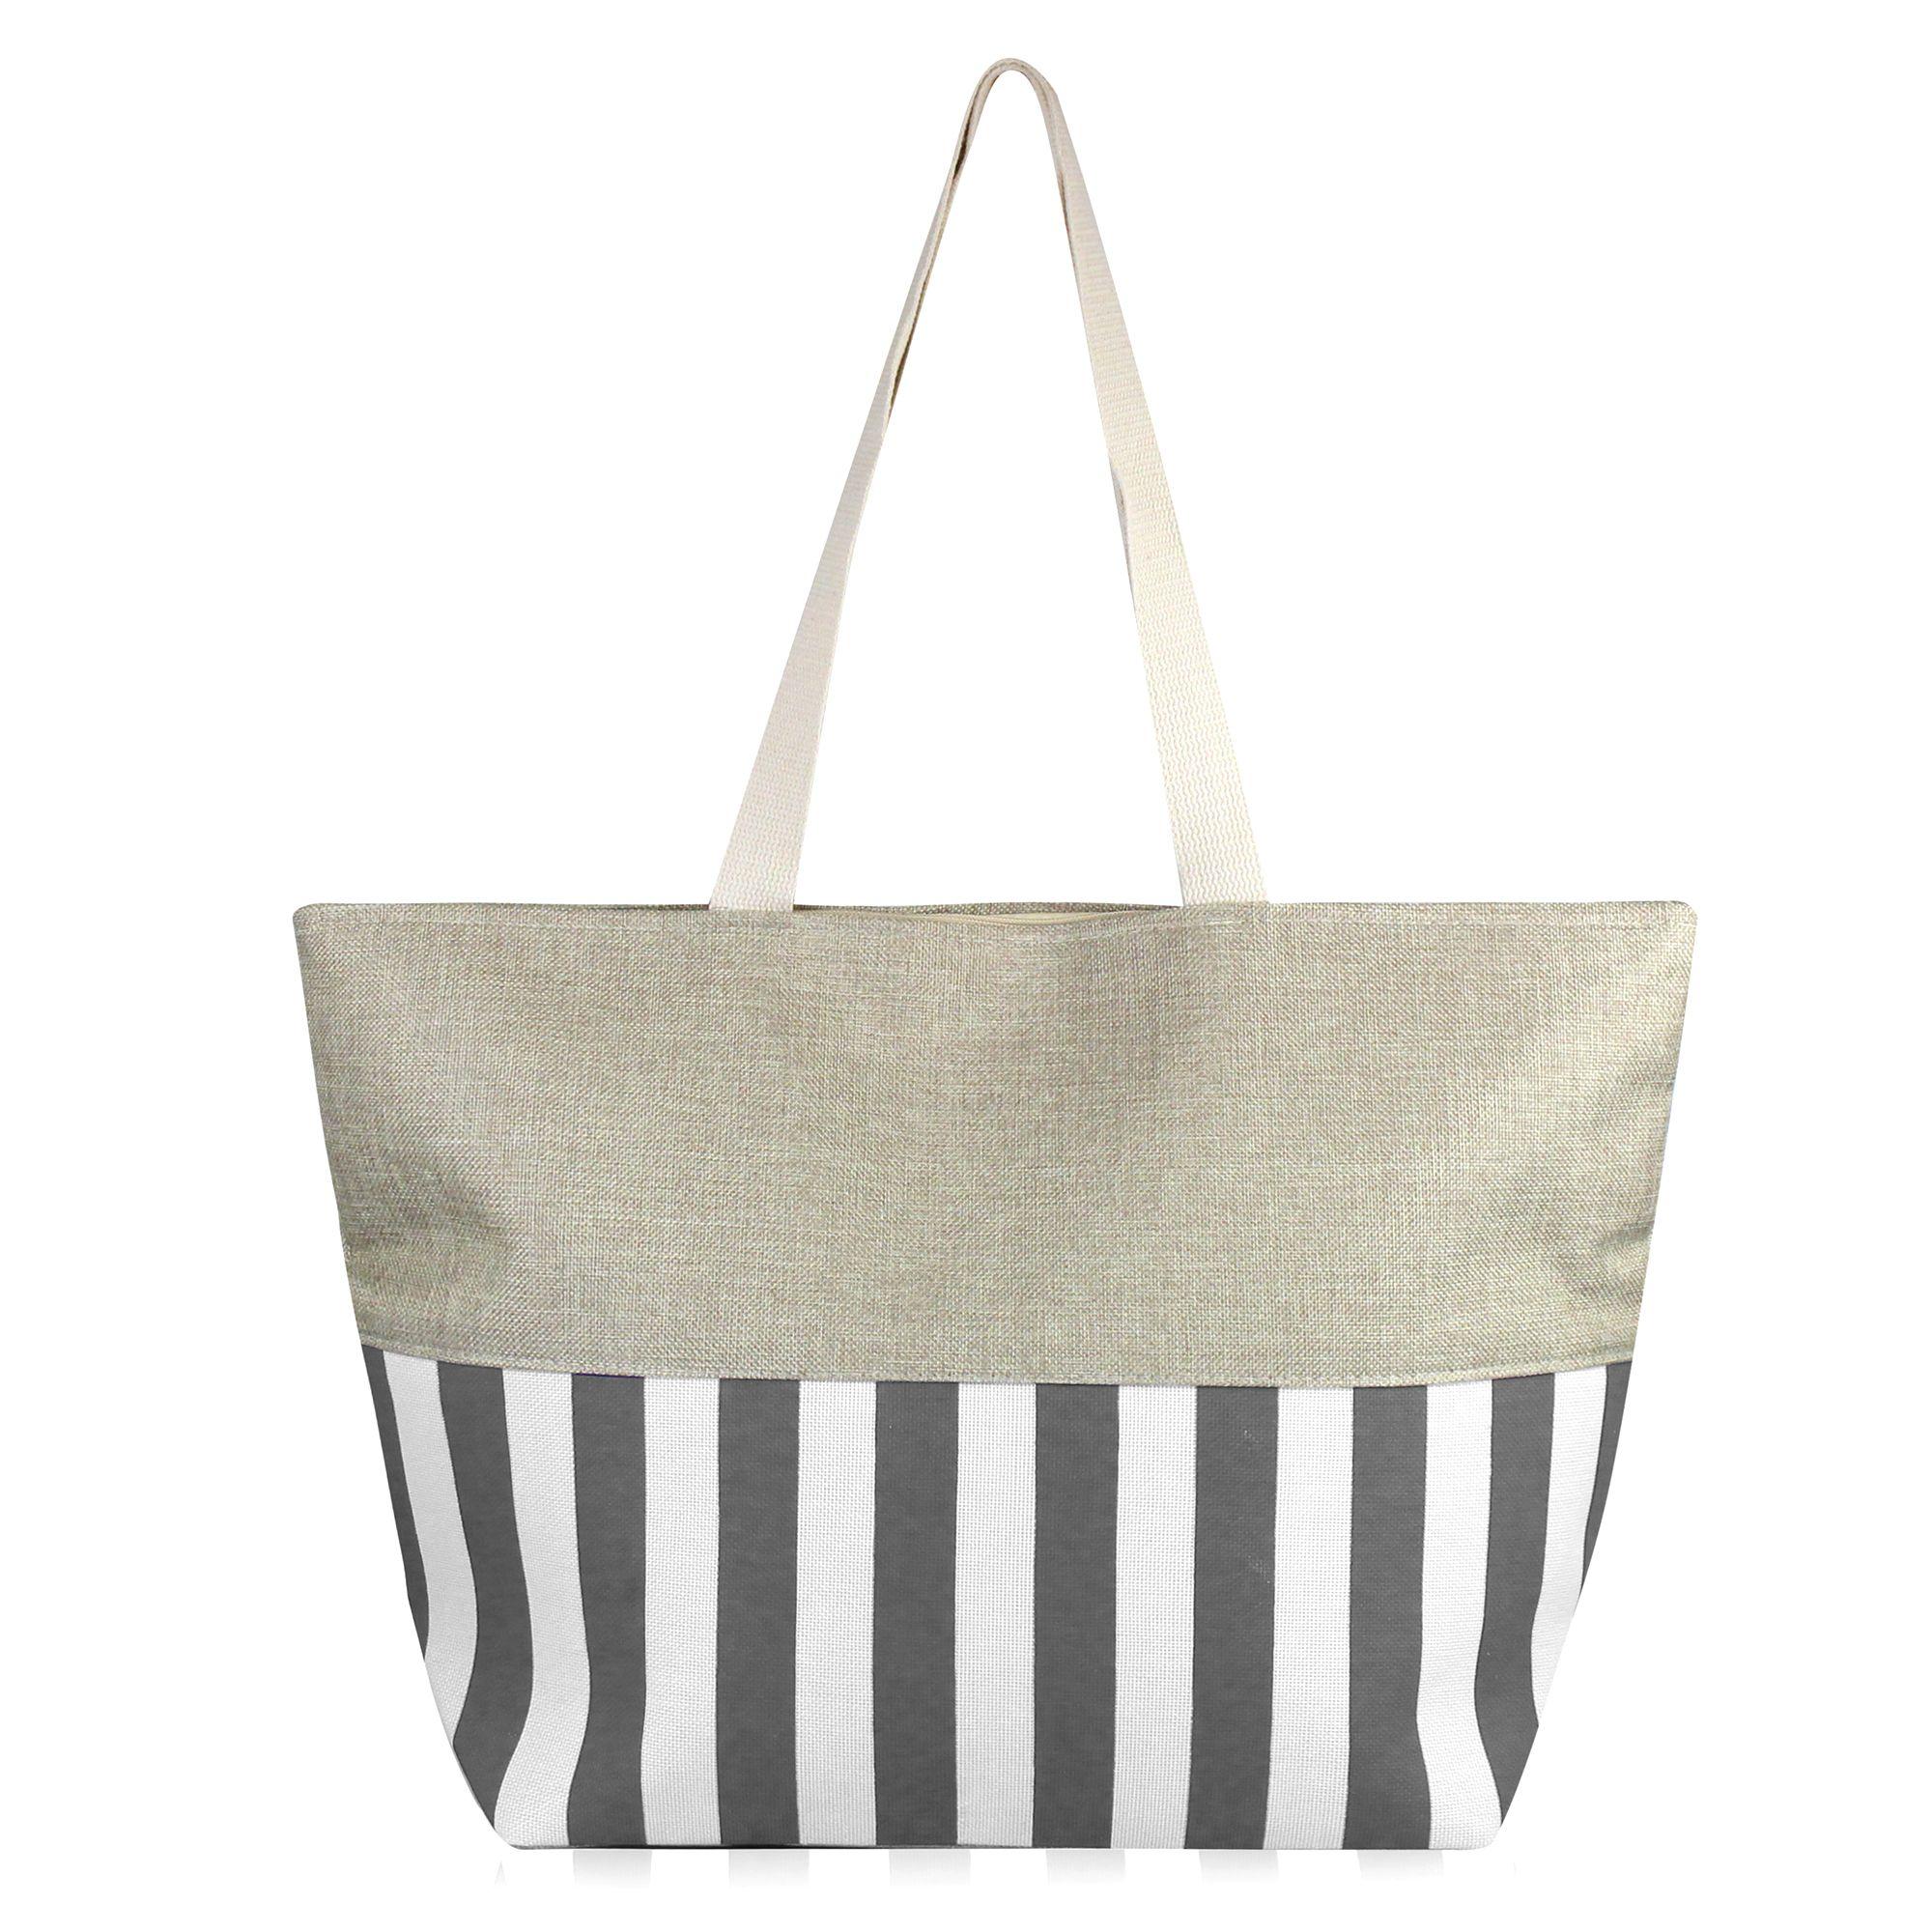 Peace Corps Volunteer Womens Tote Bags Canvas Shoulder Bag Casual Handbags